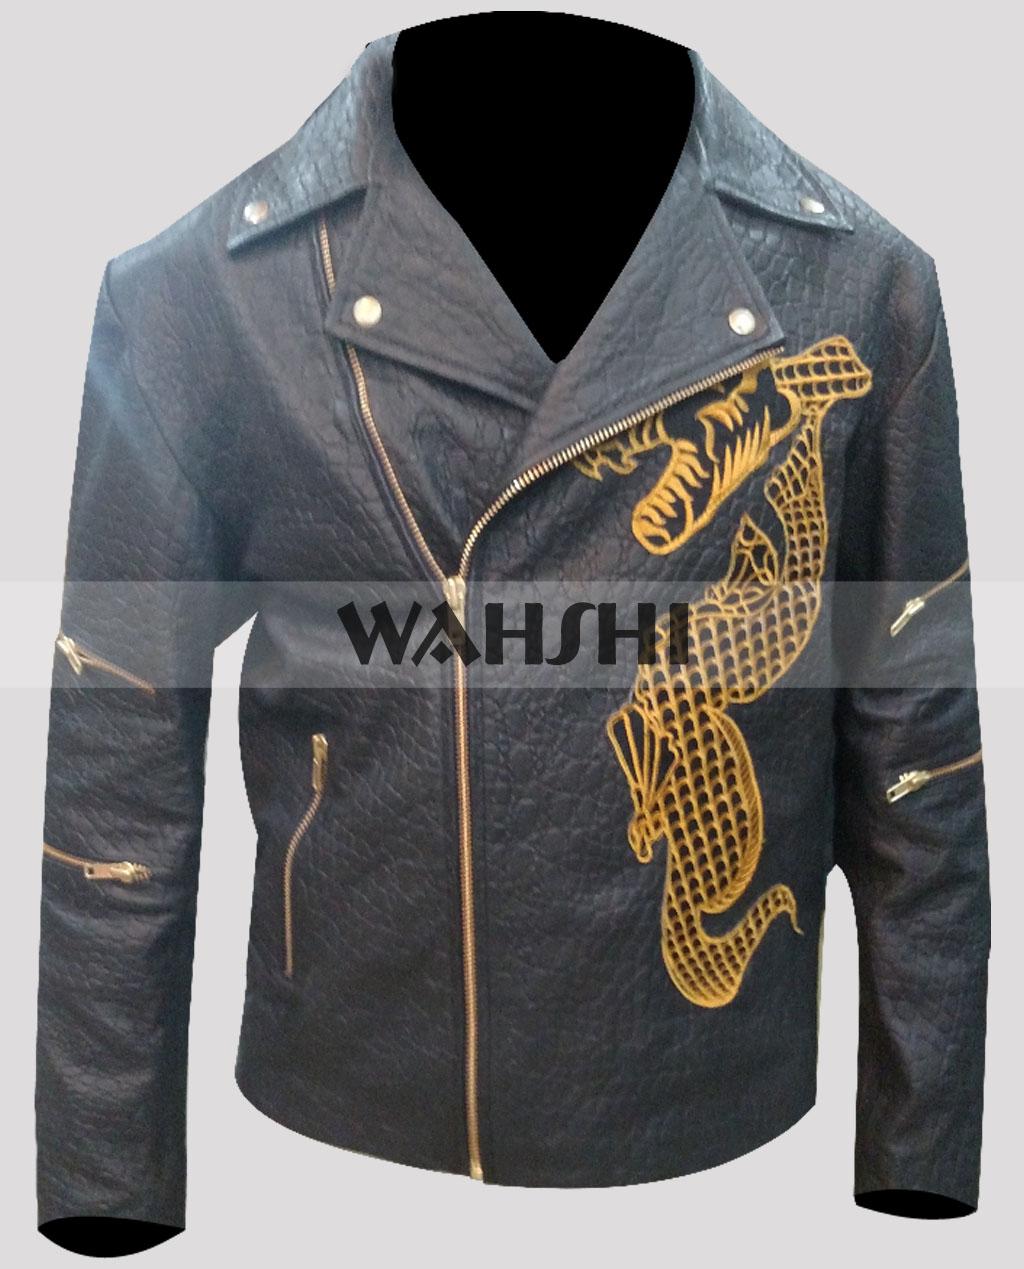 killer-croc-suicide-squad-waylon-jones-jacket